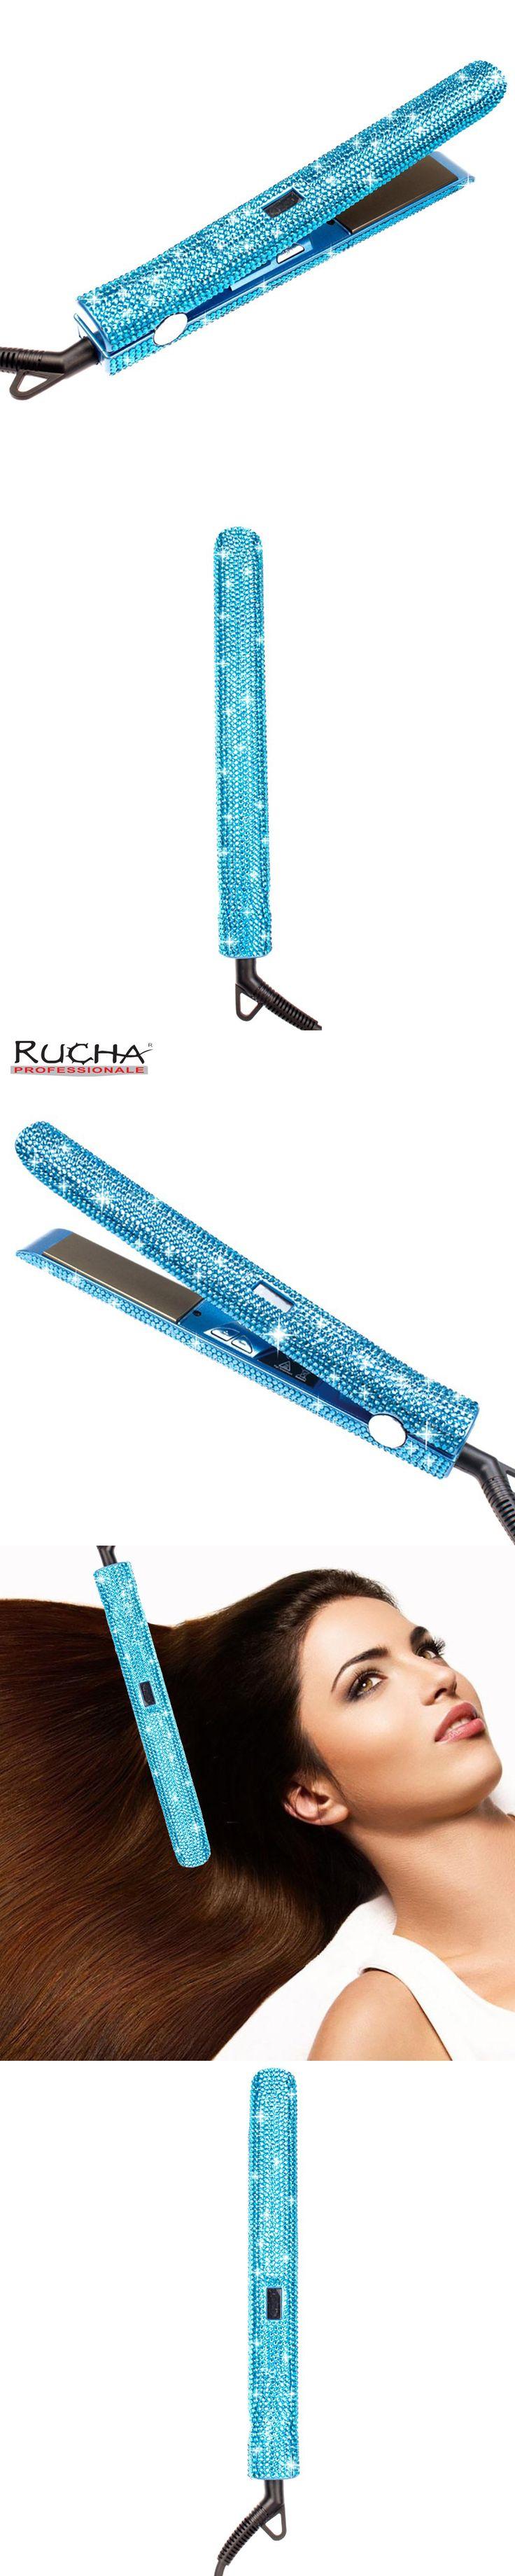 2017 New Rhinestones Handmade 470F Hair Straightener with MCH Fast Heating Electric Titanium Flat Iron as Hair Styling Tools